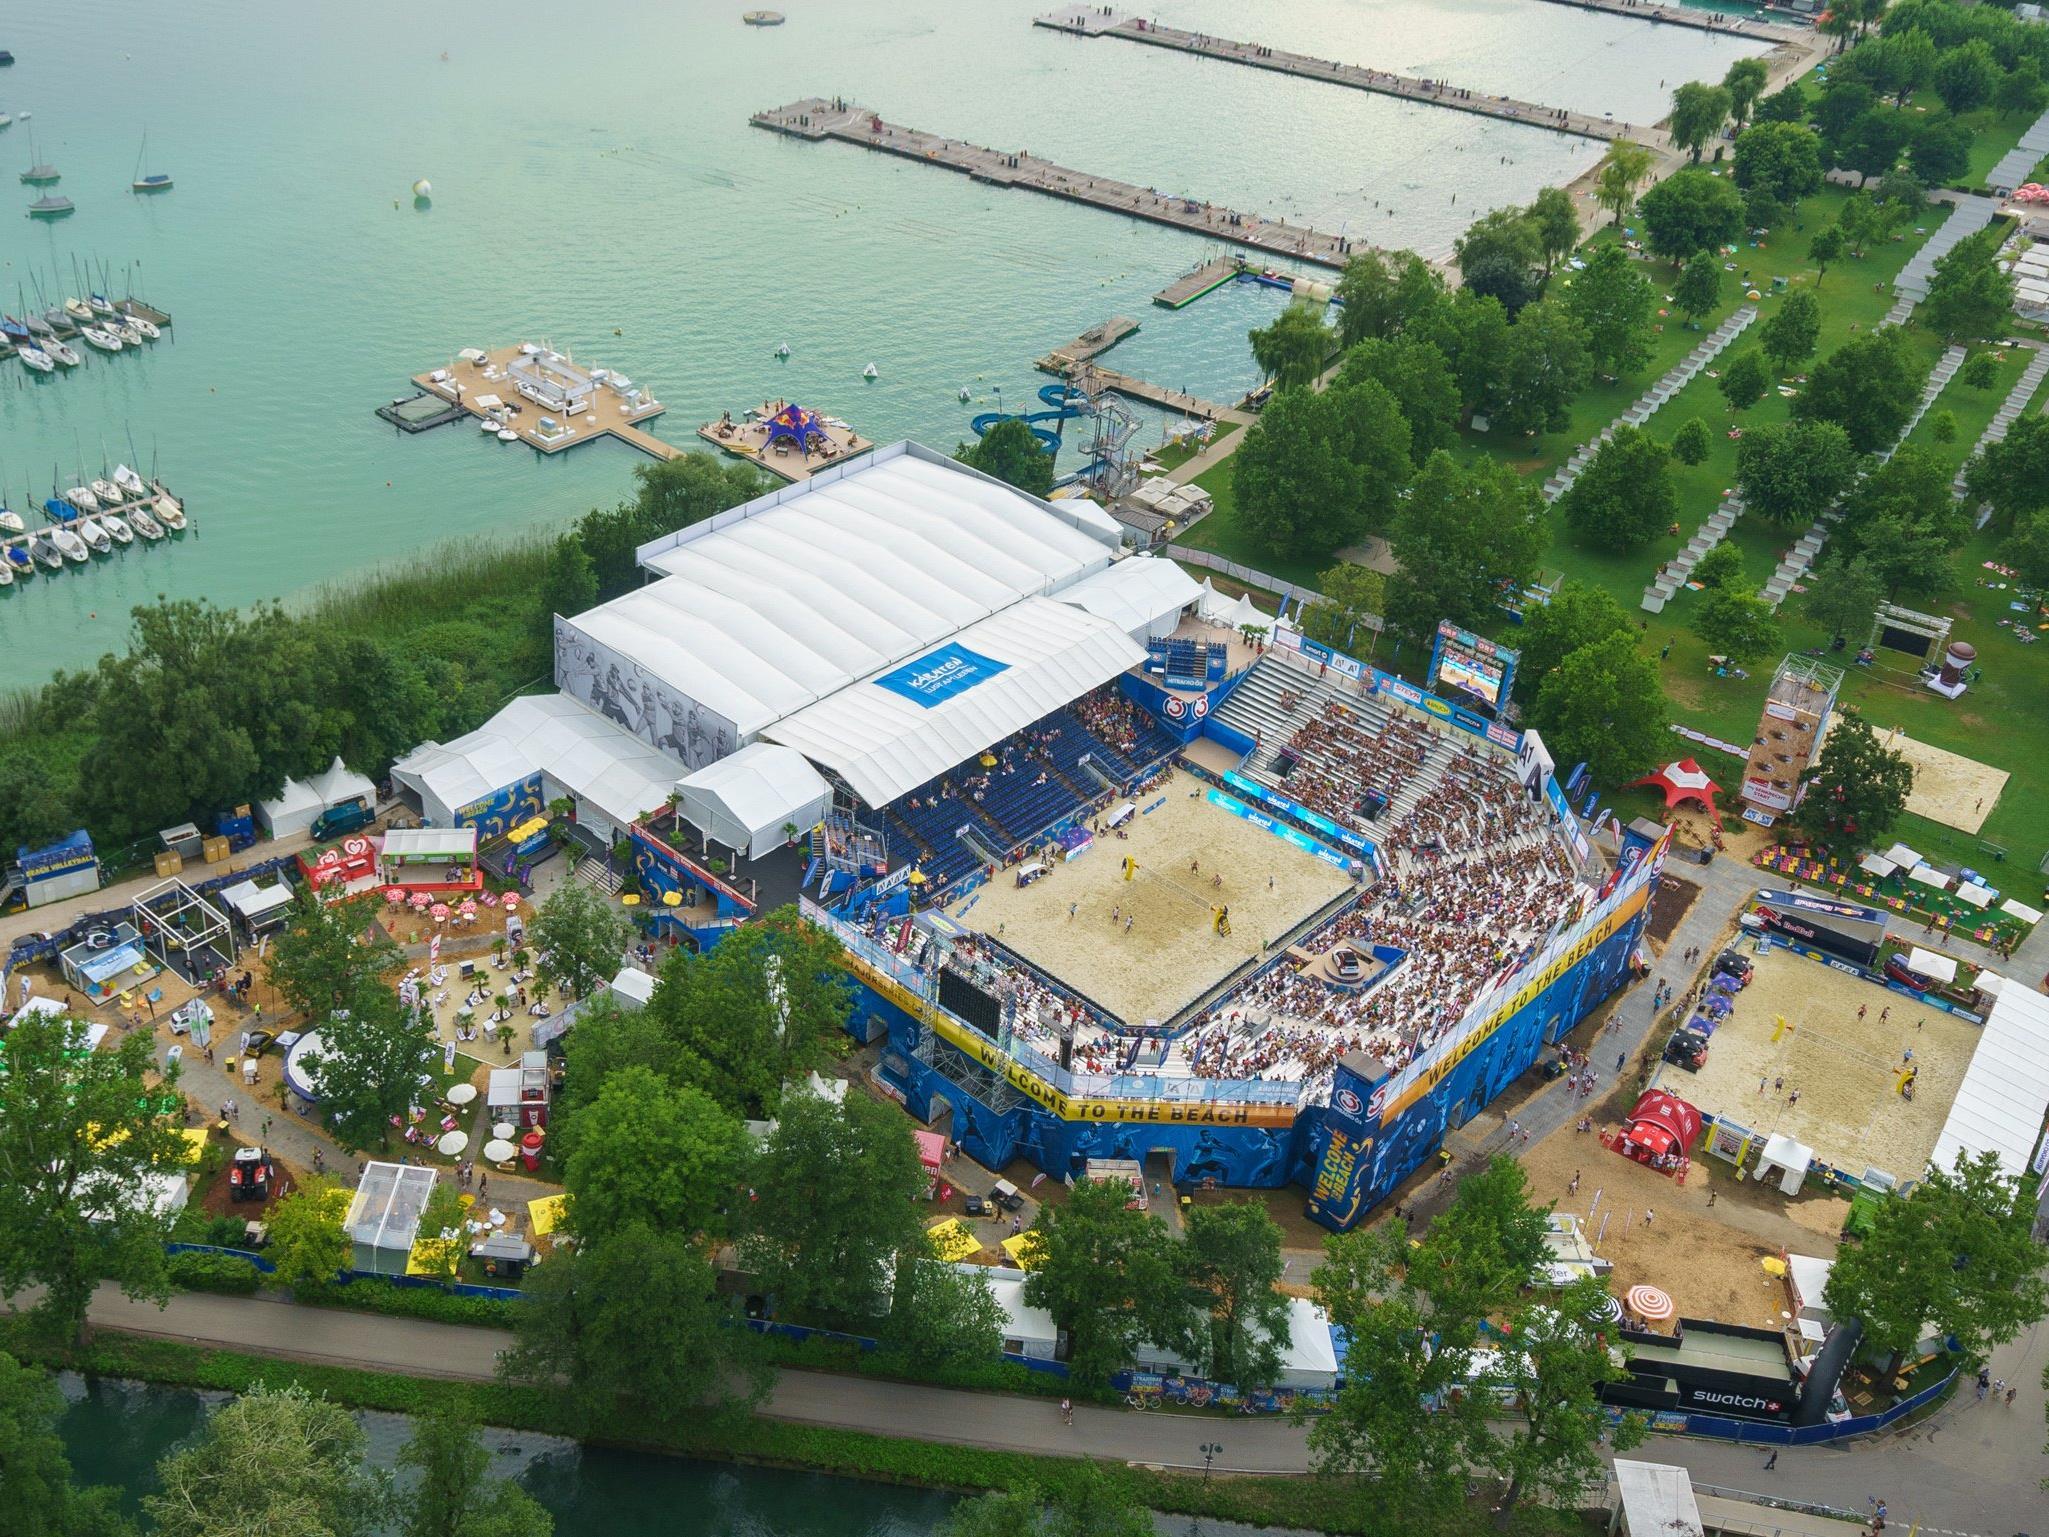 Die Beachvolleyball-Arena in Klagenfurt.